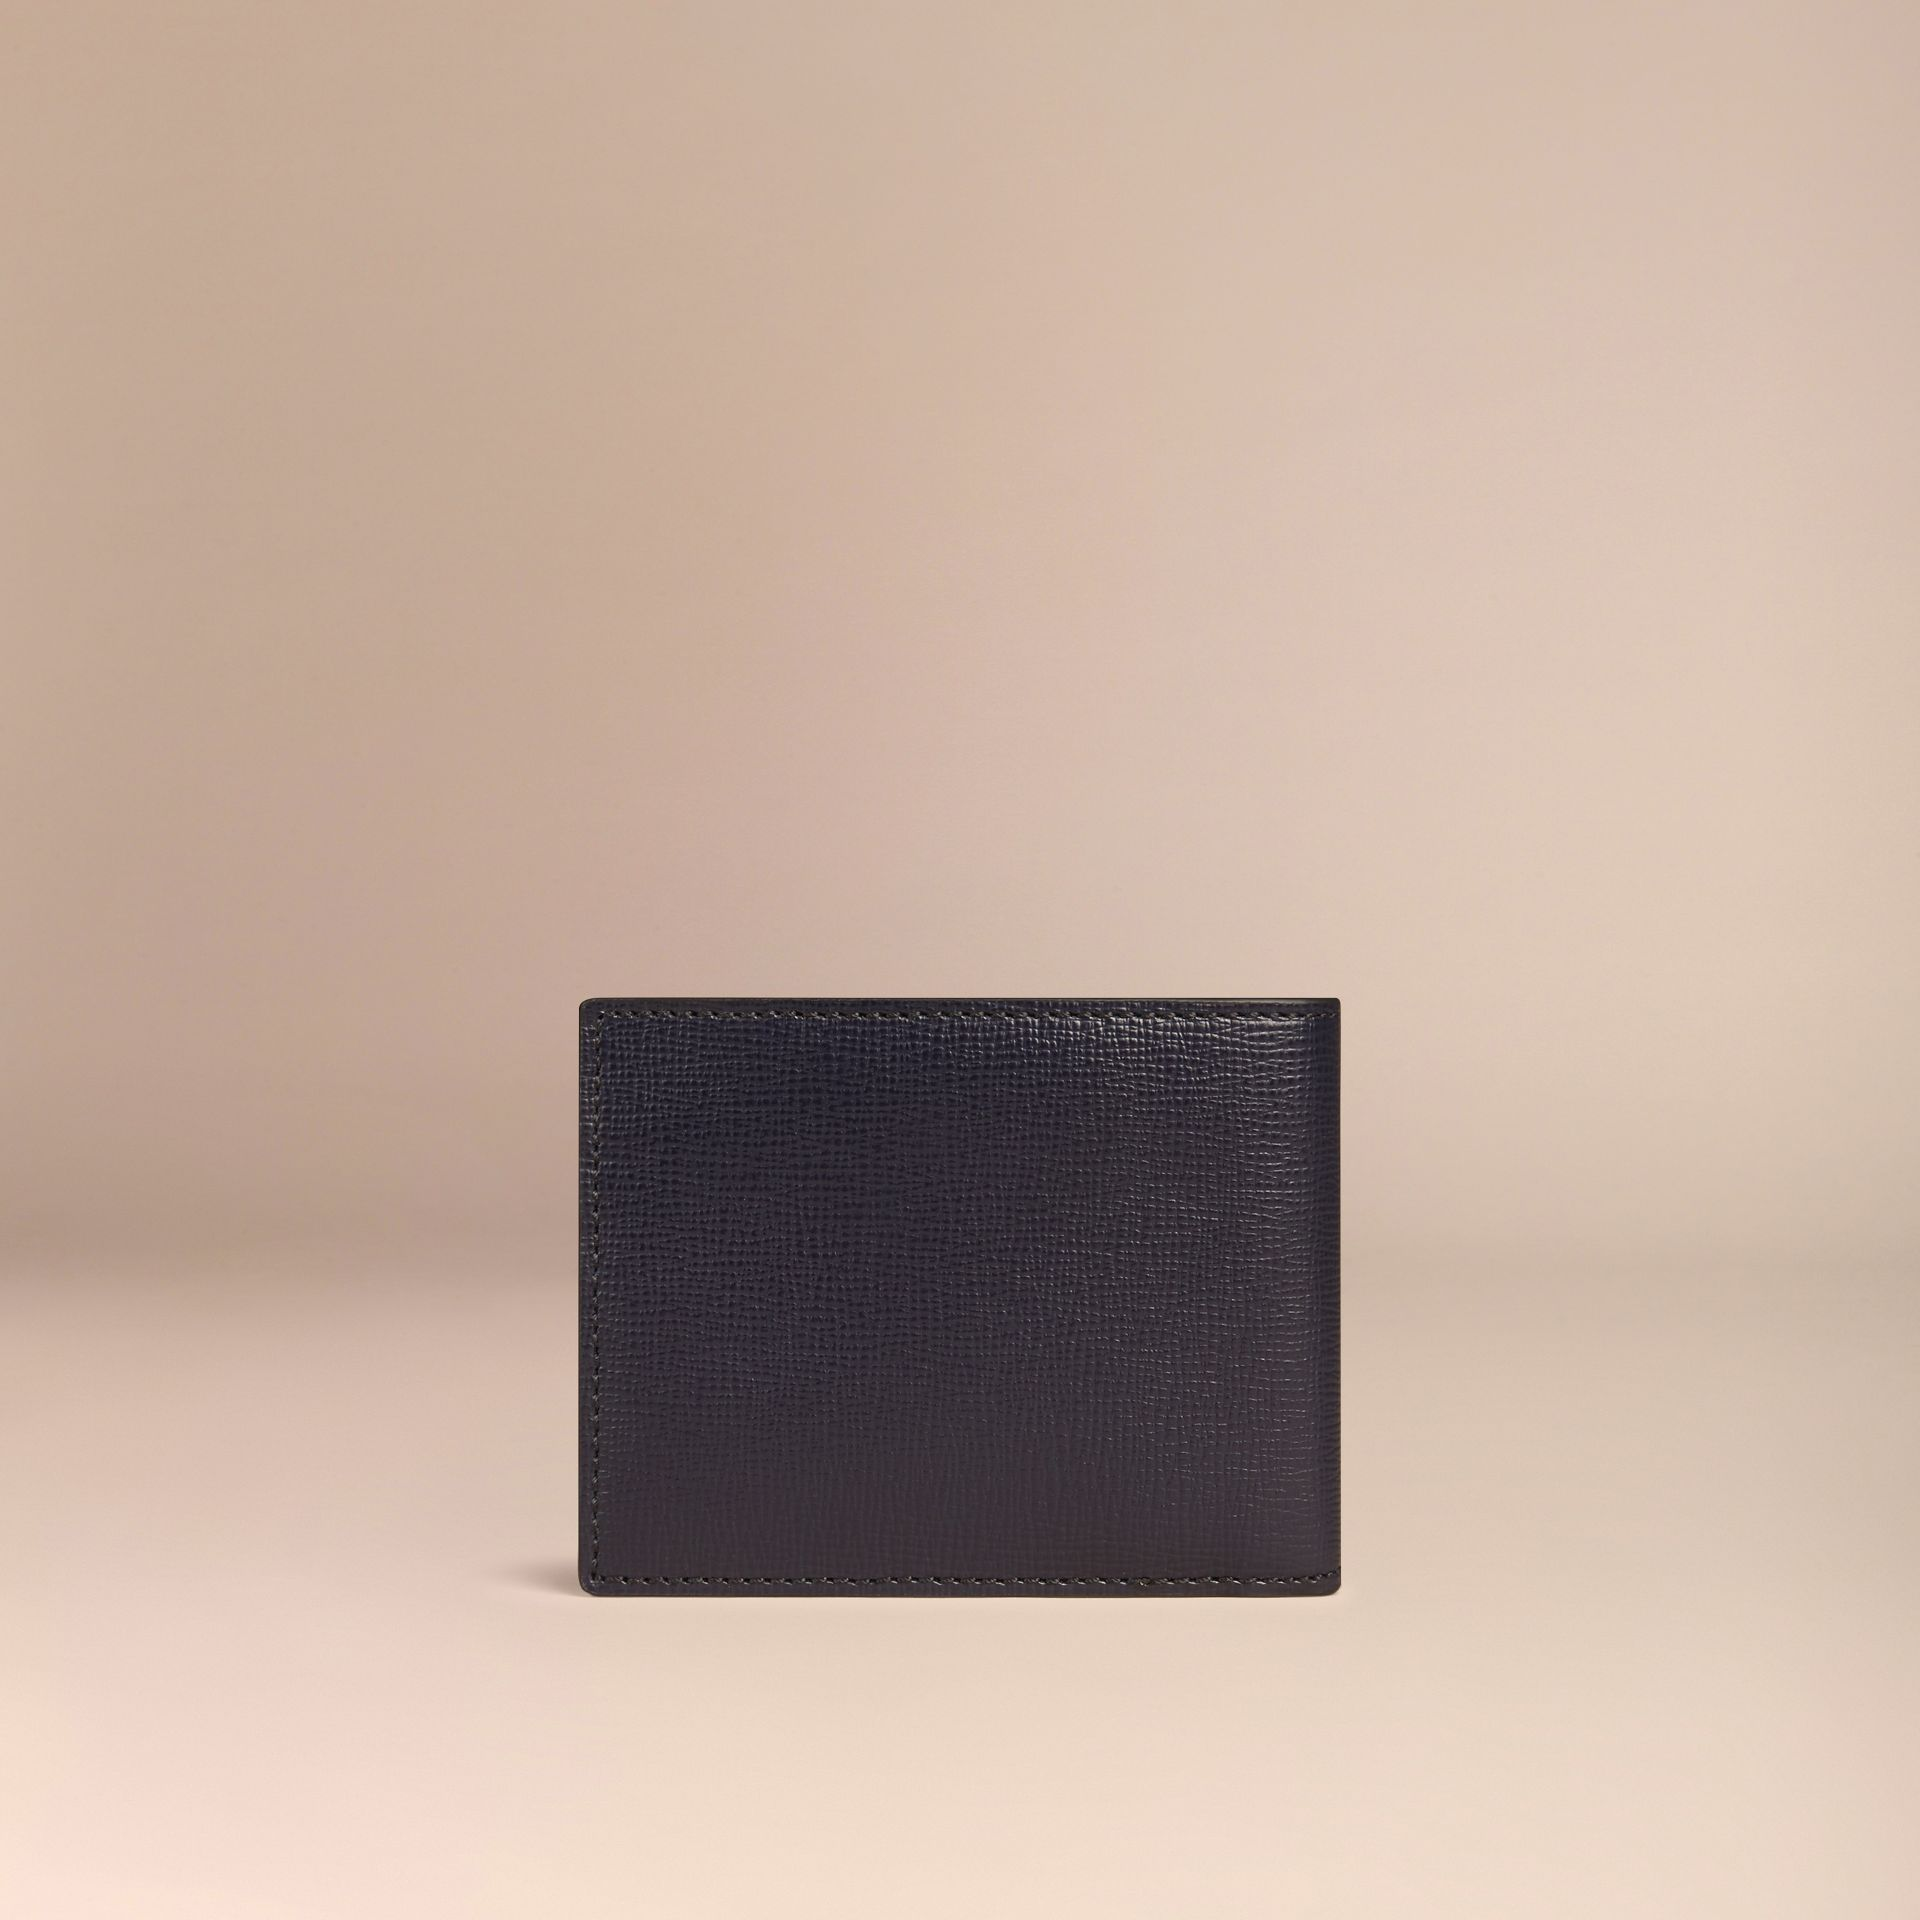 Dark navy London Leather Folding Wallet Dark Navy - gallery image 3